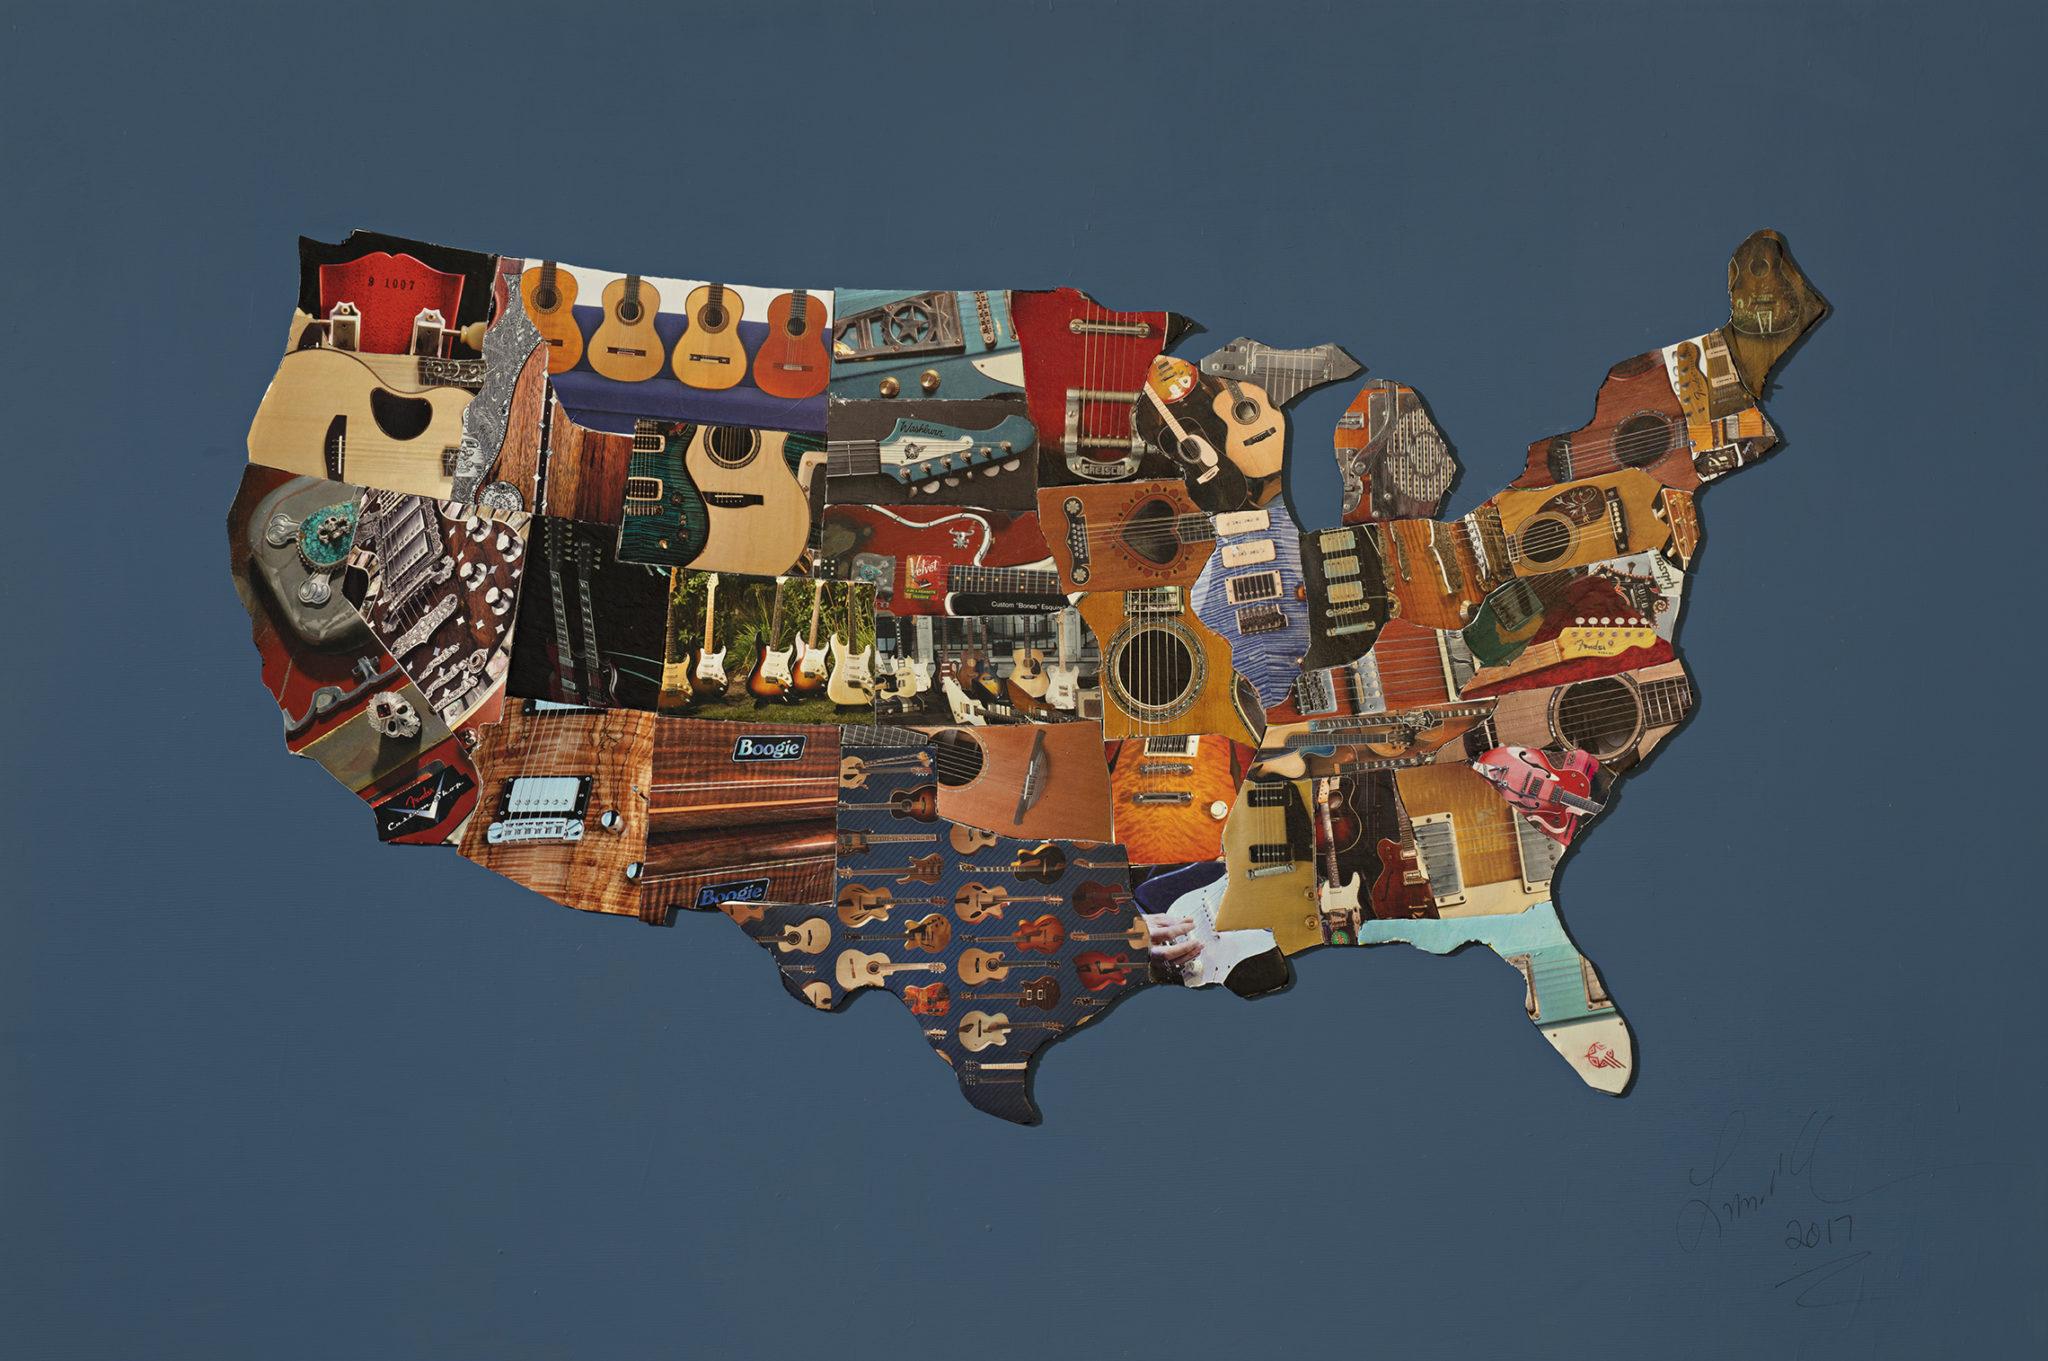 L. M. Lieberman, United Map of Guitars; Original Mixed Media Art Piece